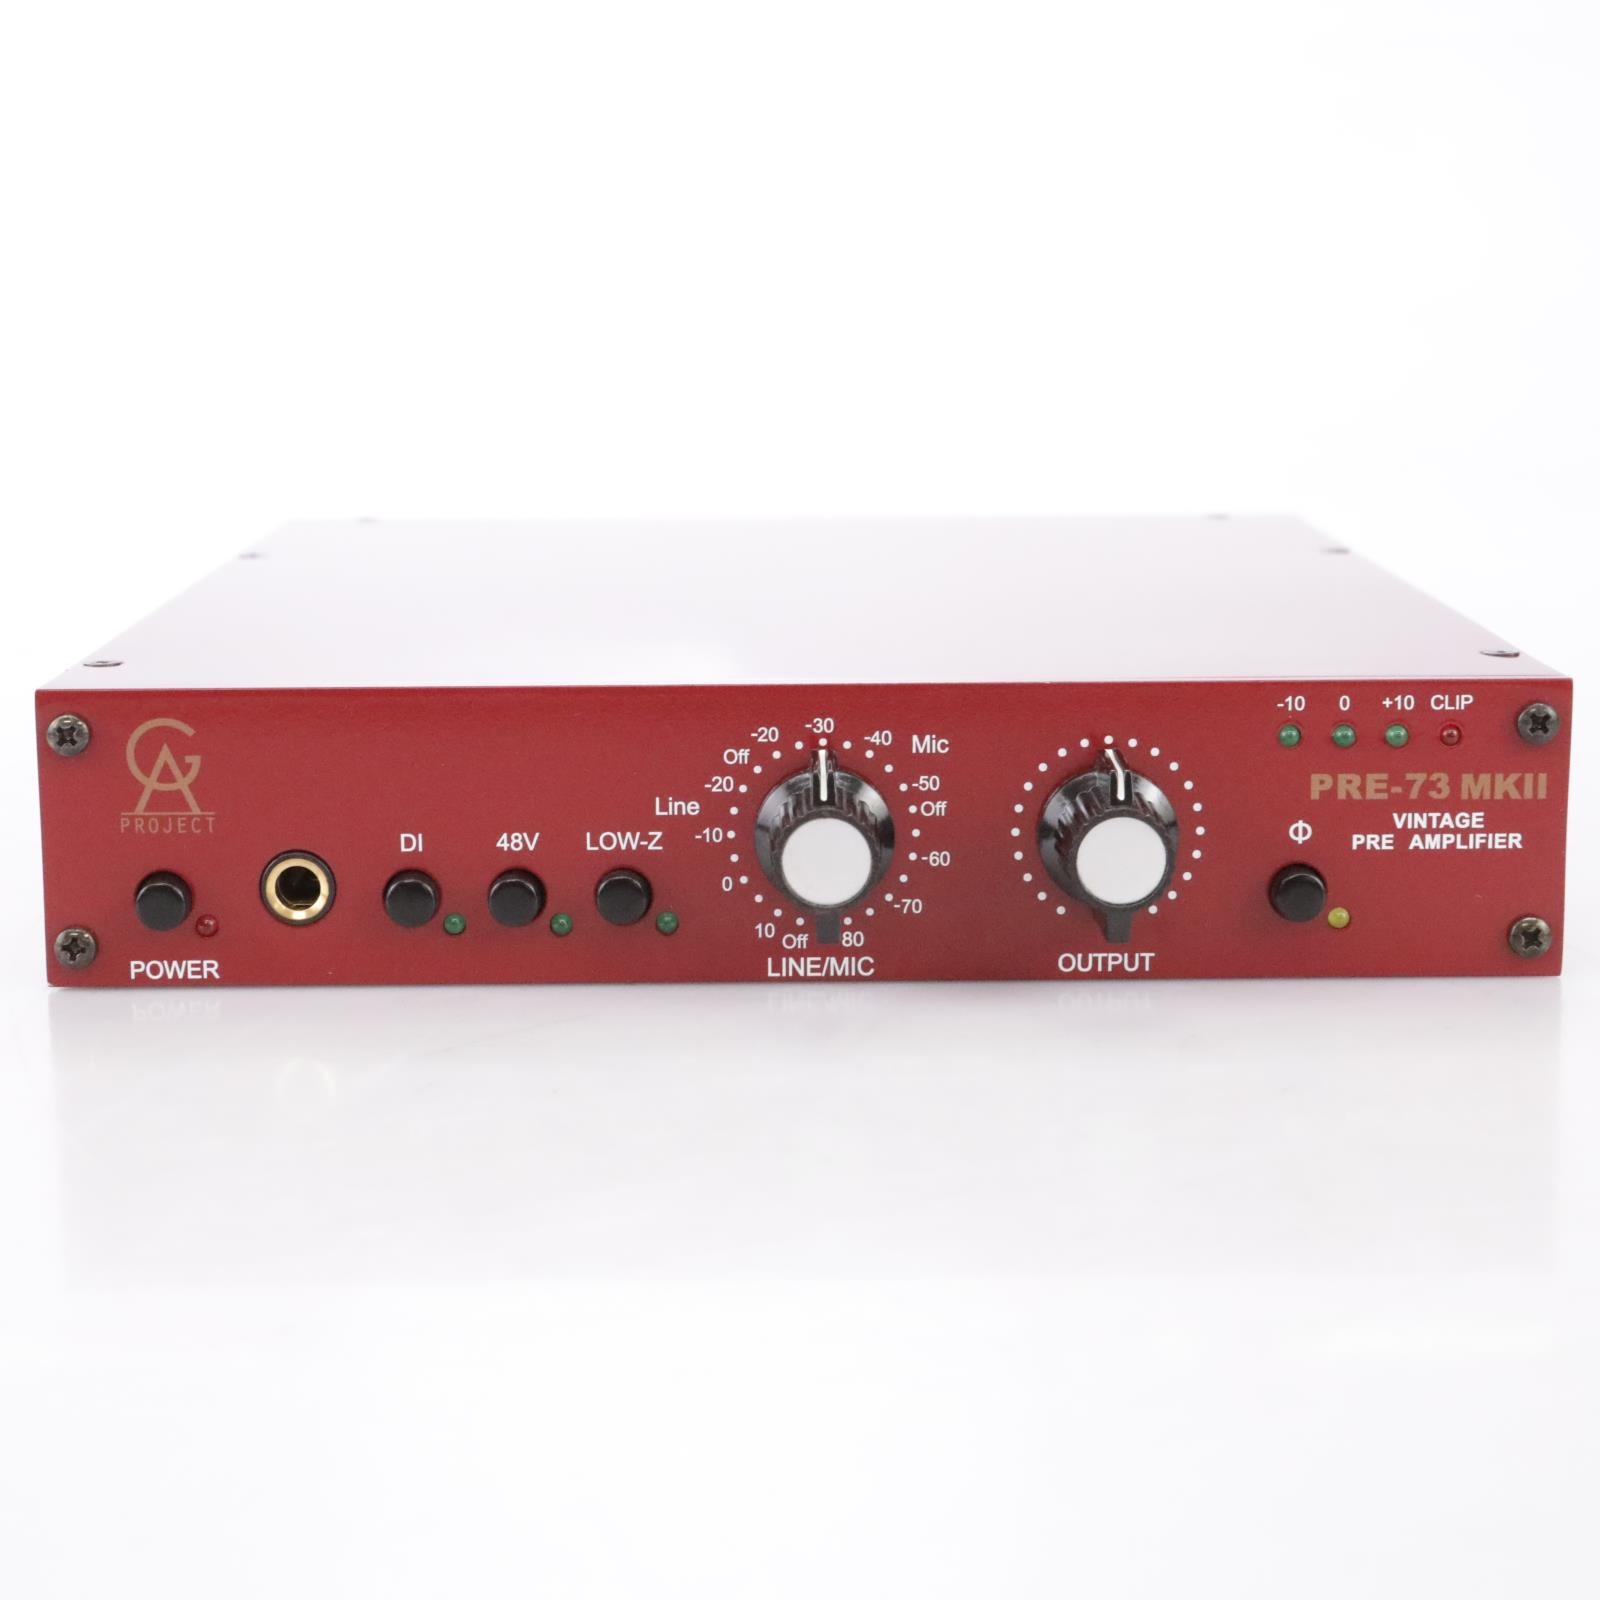 Golden Age Pre-73 MK-II Vintage Style Pre Amplifier Mic Pre #43811